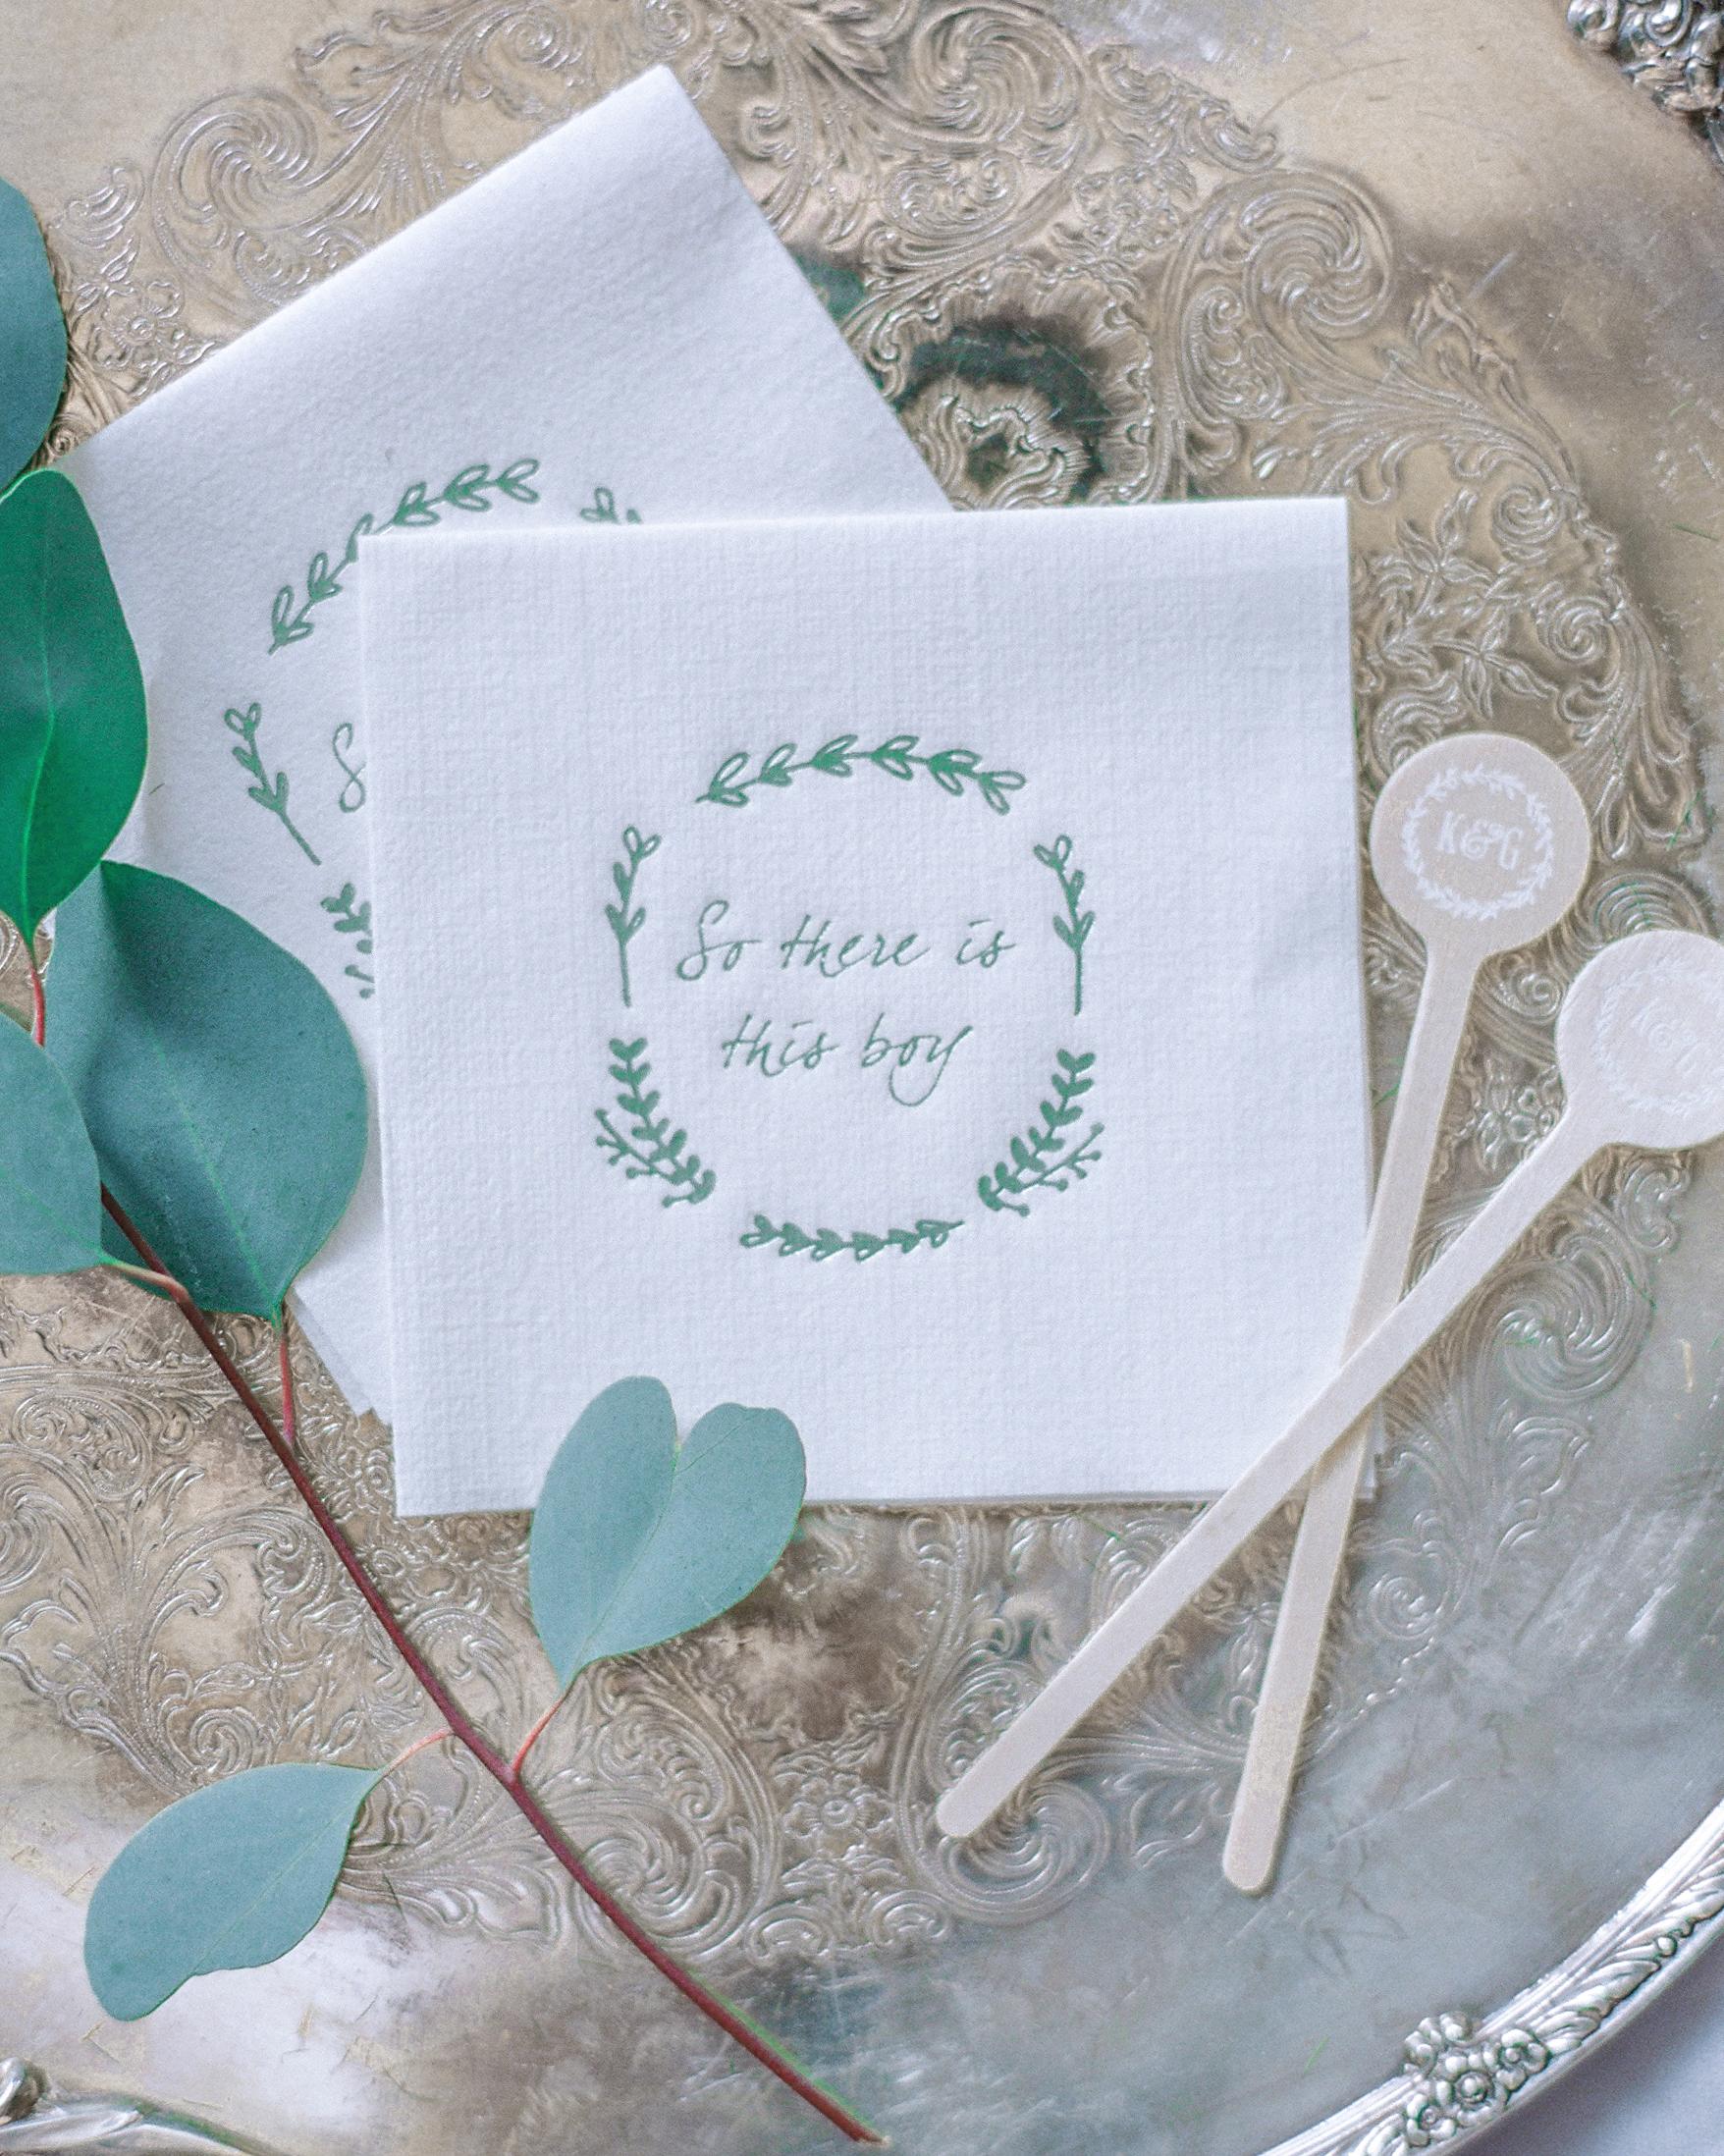 kendall-grant-wedding-cocktailnapkins-020-s112328-1215.jpg